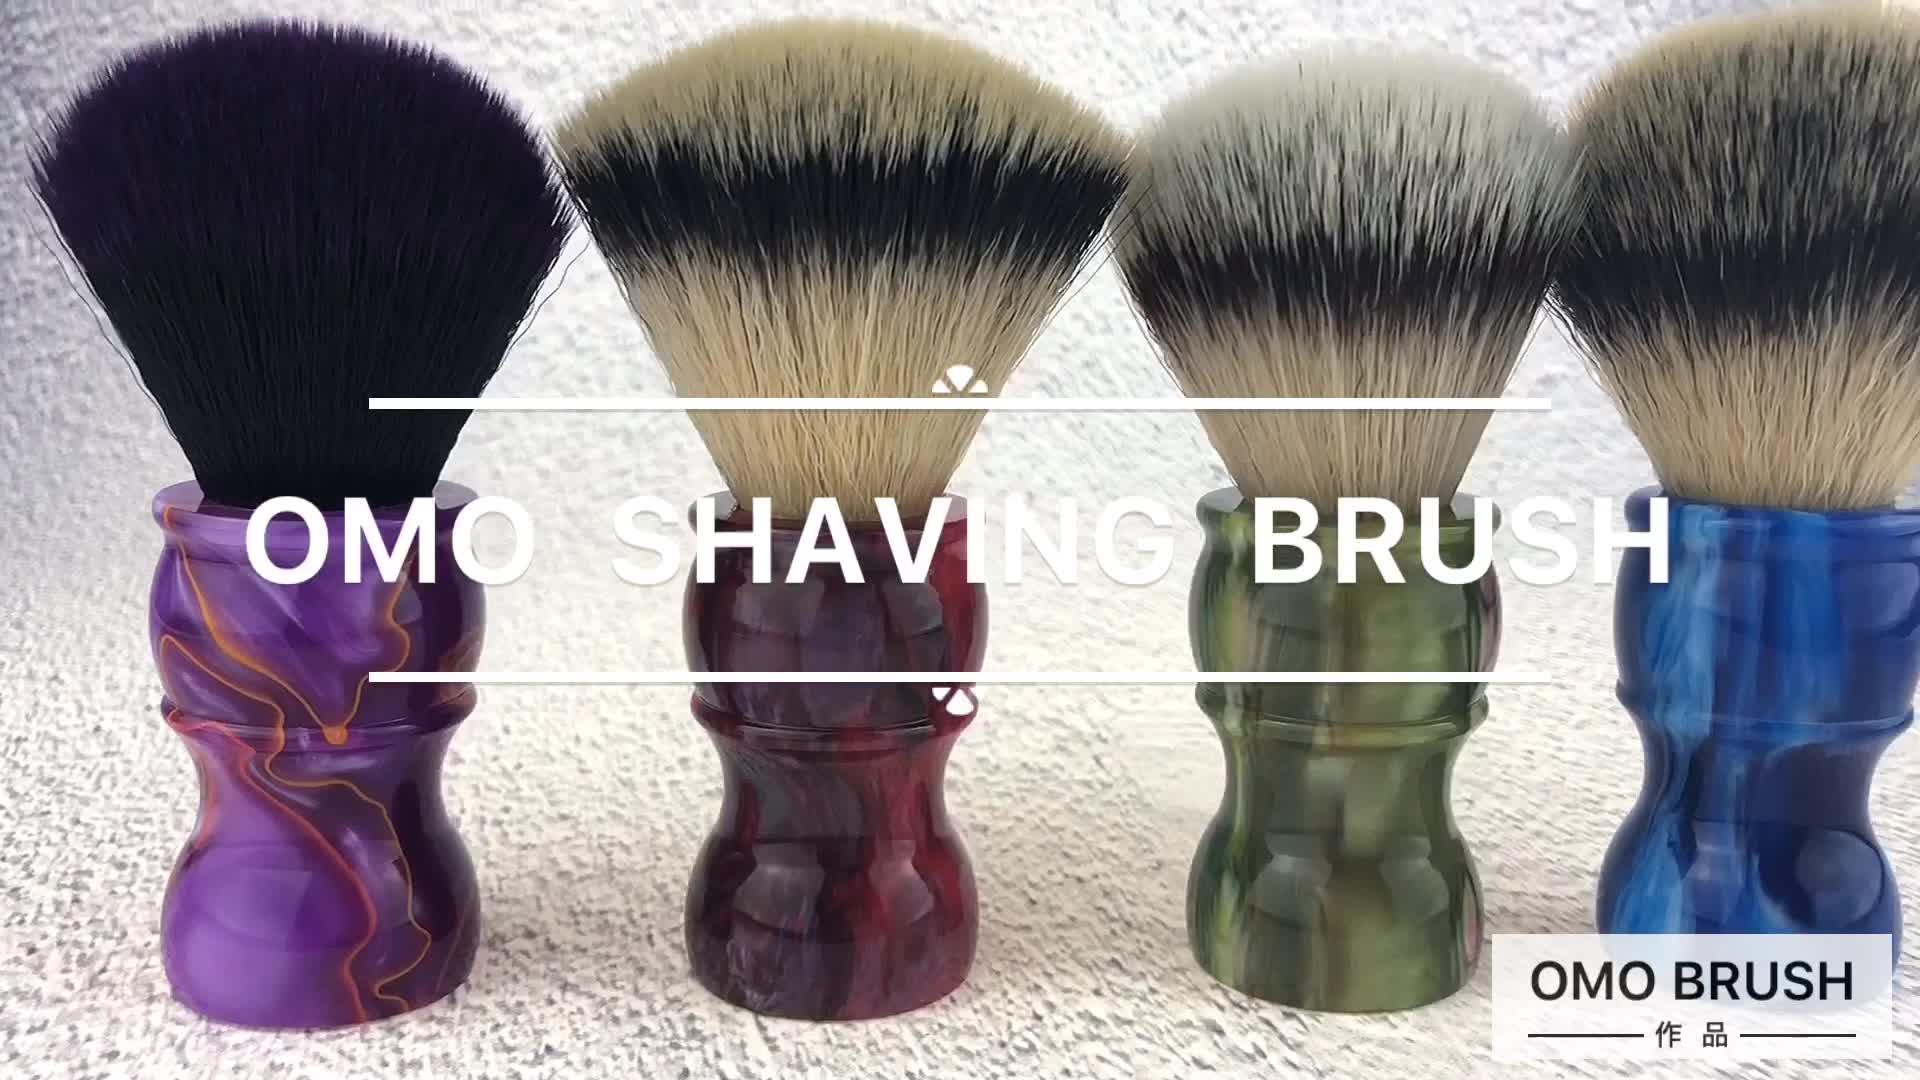 OUMO--Wholesale Private Label Resin Handle Shaving Brush Handles